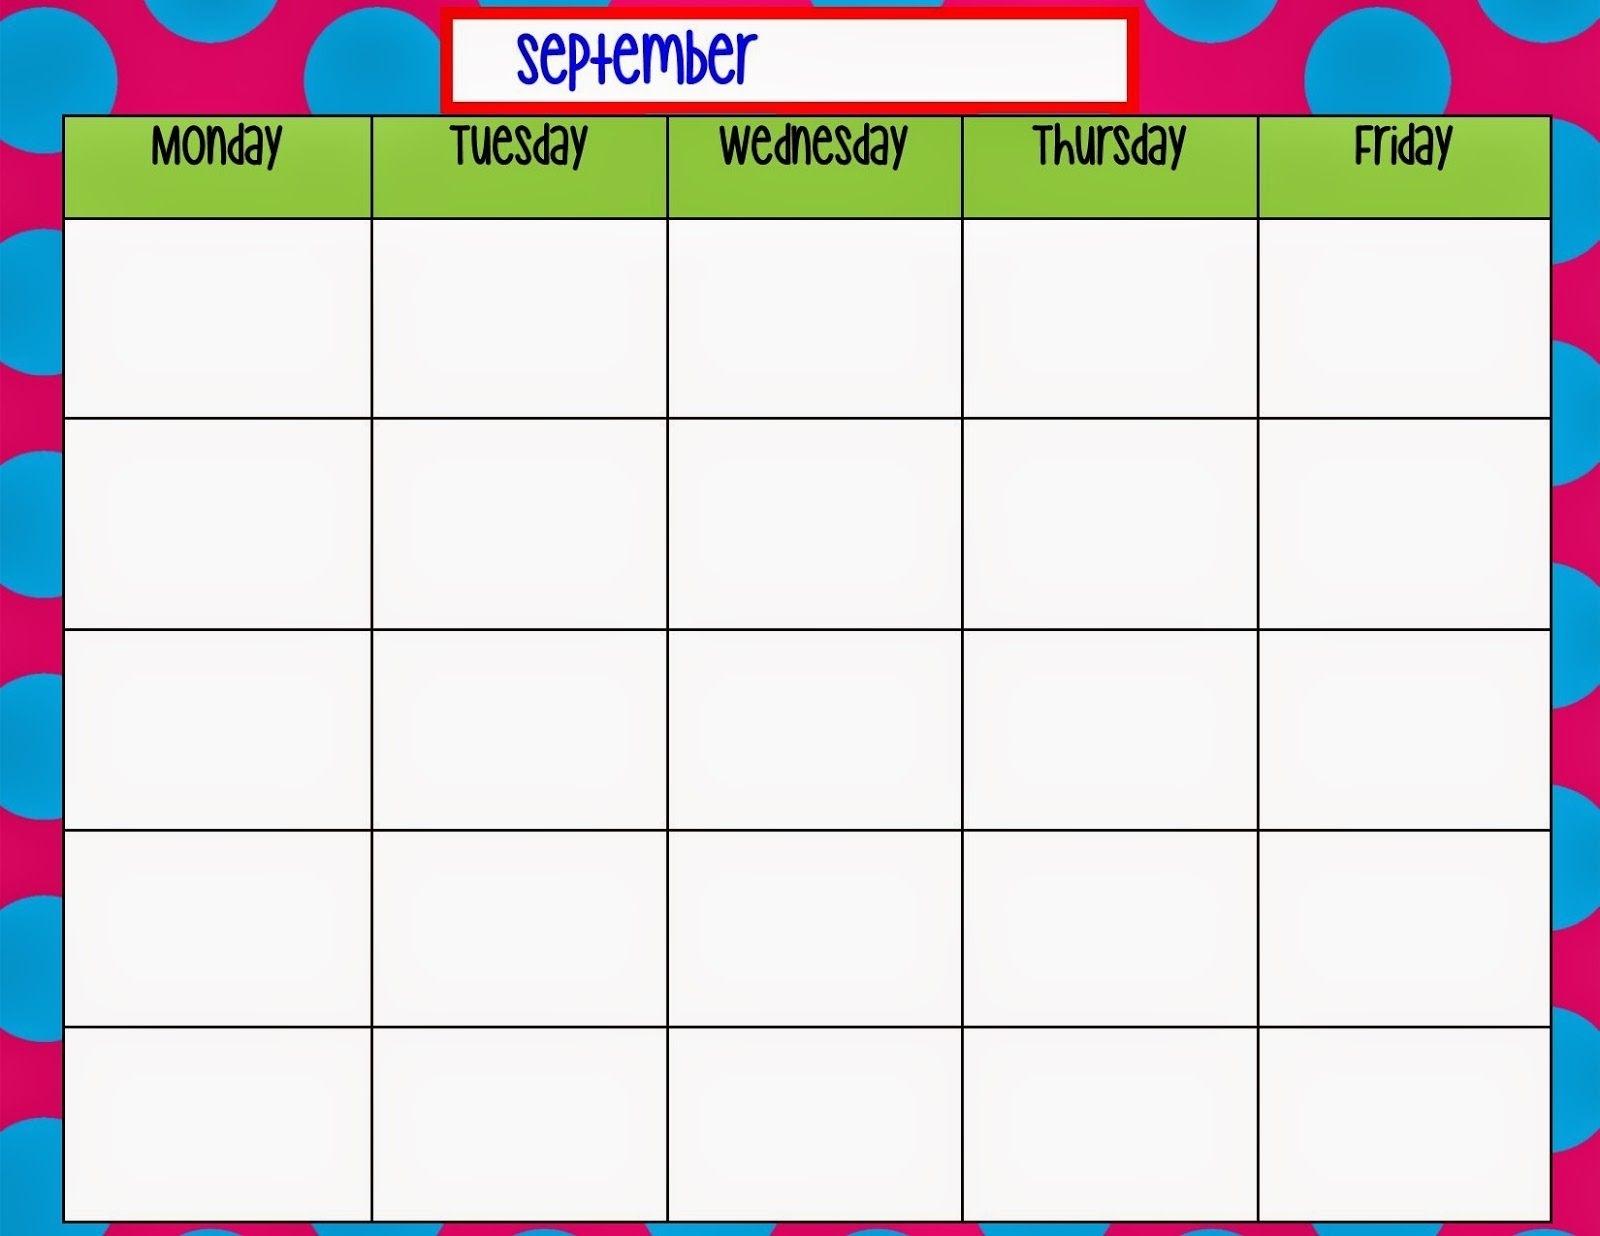 Monday Through Friday Calendar Template | Preschool | Printable inside Behavior Weekly Calendar Template Free